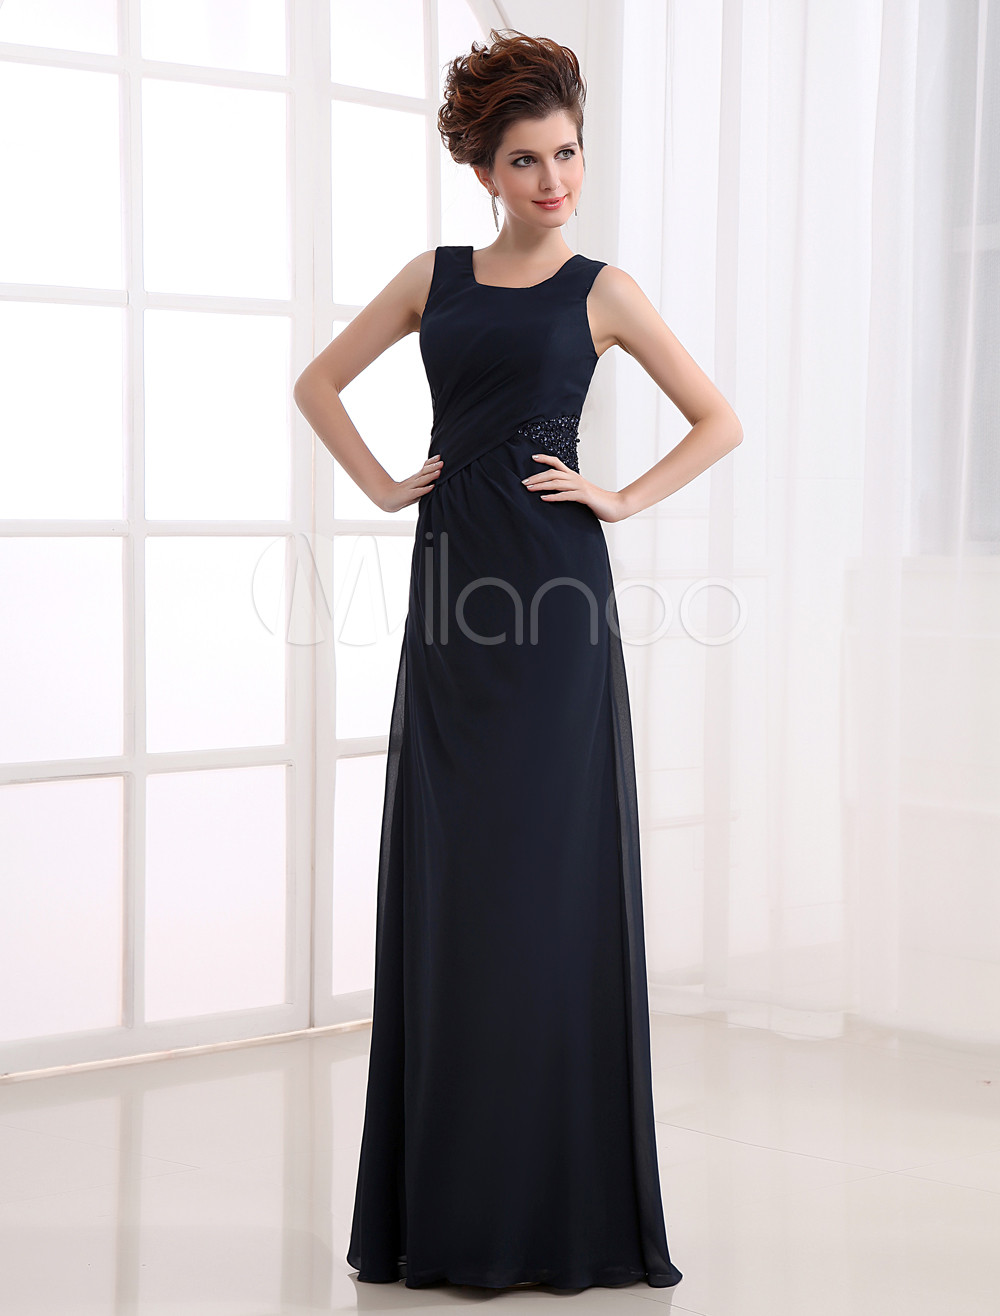 Elegant Deep Navy Blue Spinning Prom Dress (Wedding Evening Dresses) photo